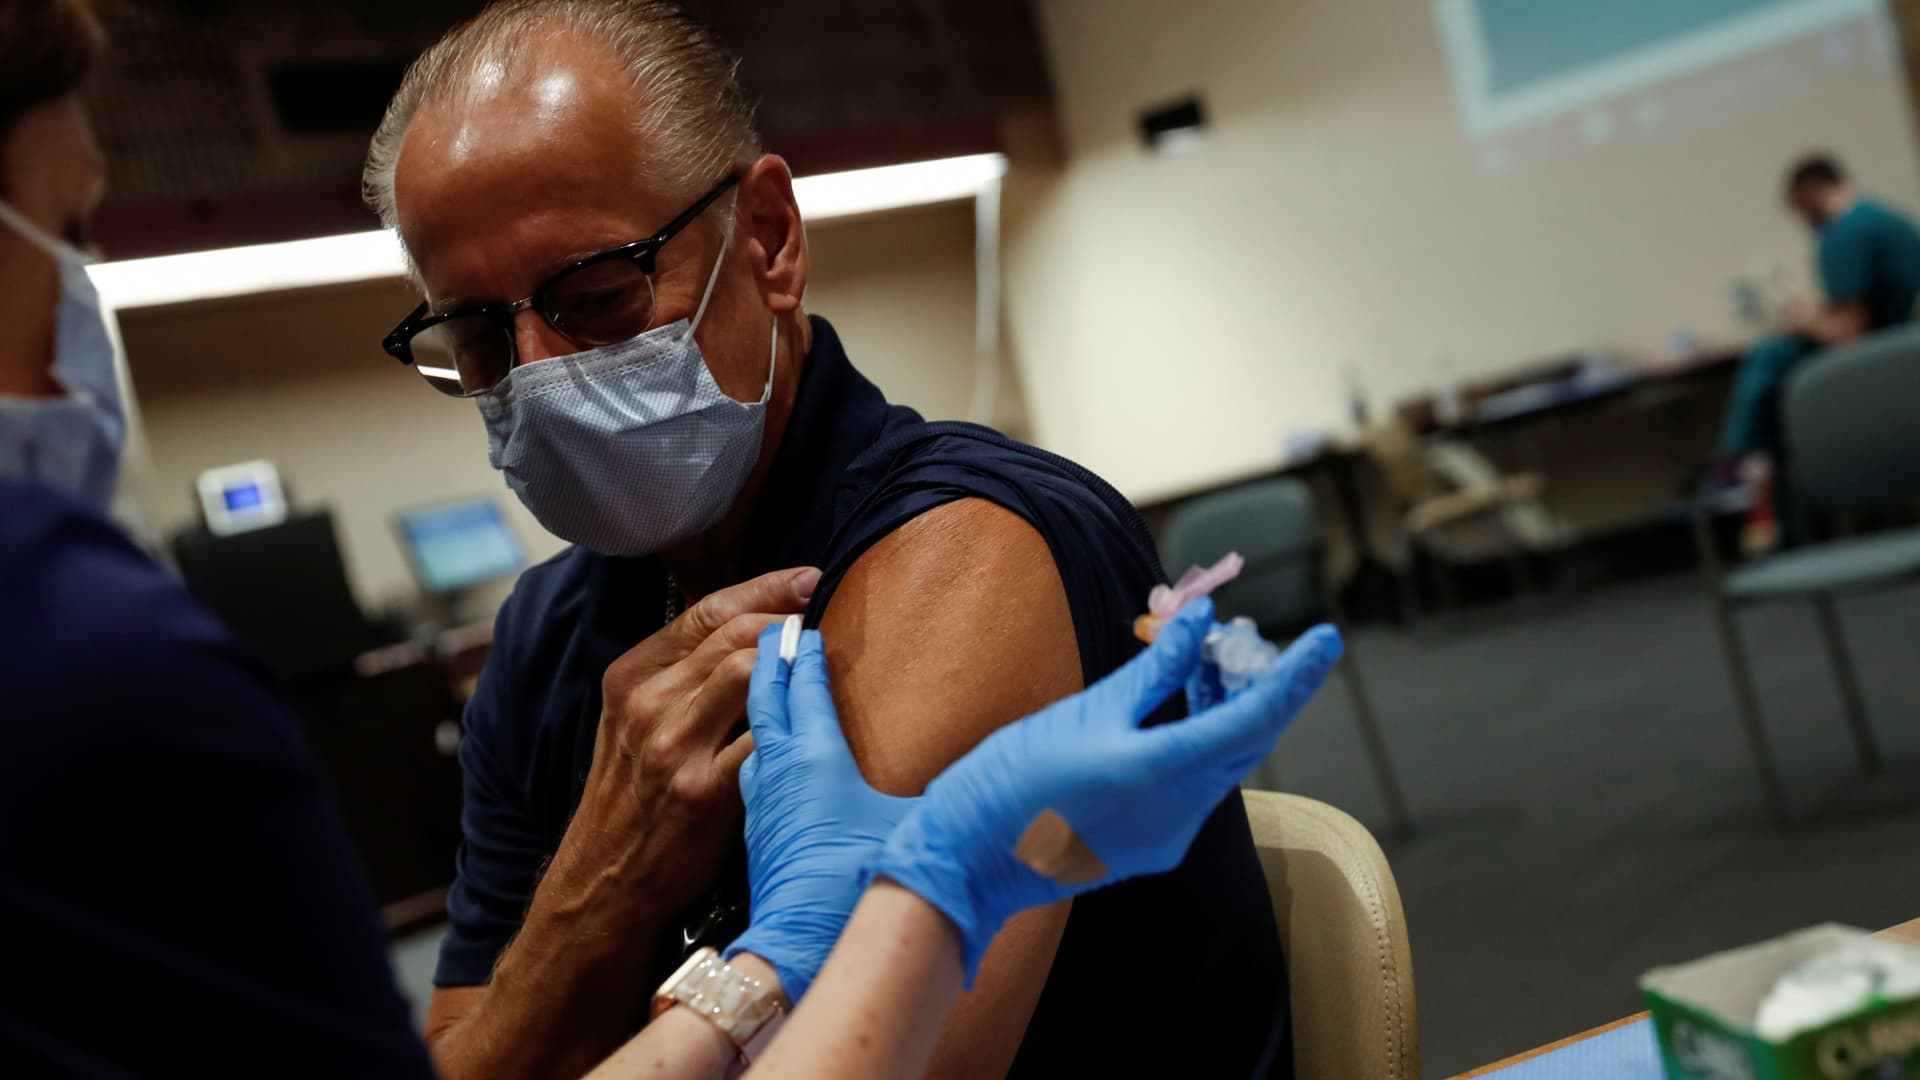 A registered nurse applies a dose of the Moderna COVID-19 vaccine to Sarasota Hospital worker Larry Hammers, 62, at the Sarasota Memorial Hospital in Sarasota, Florida, September 24, 2021.